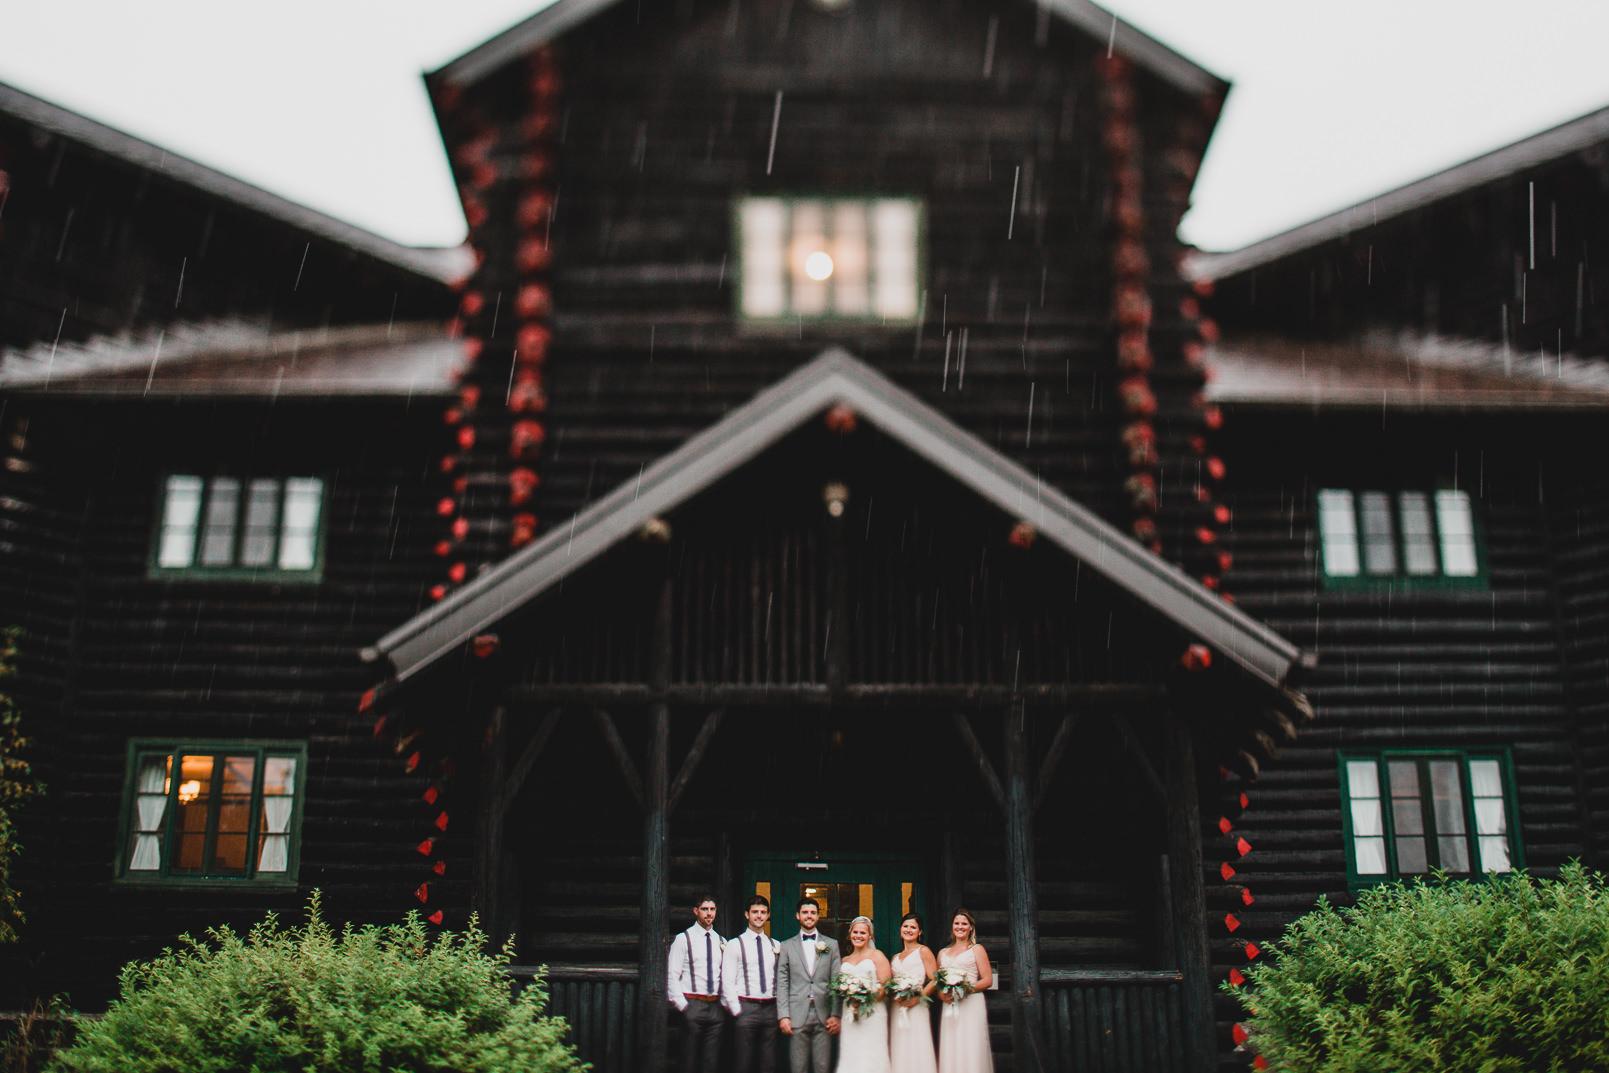 046-Jonathan-Kuhn-Photography-Wedding-_mini.jpg